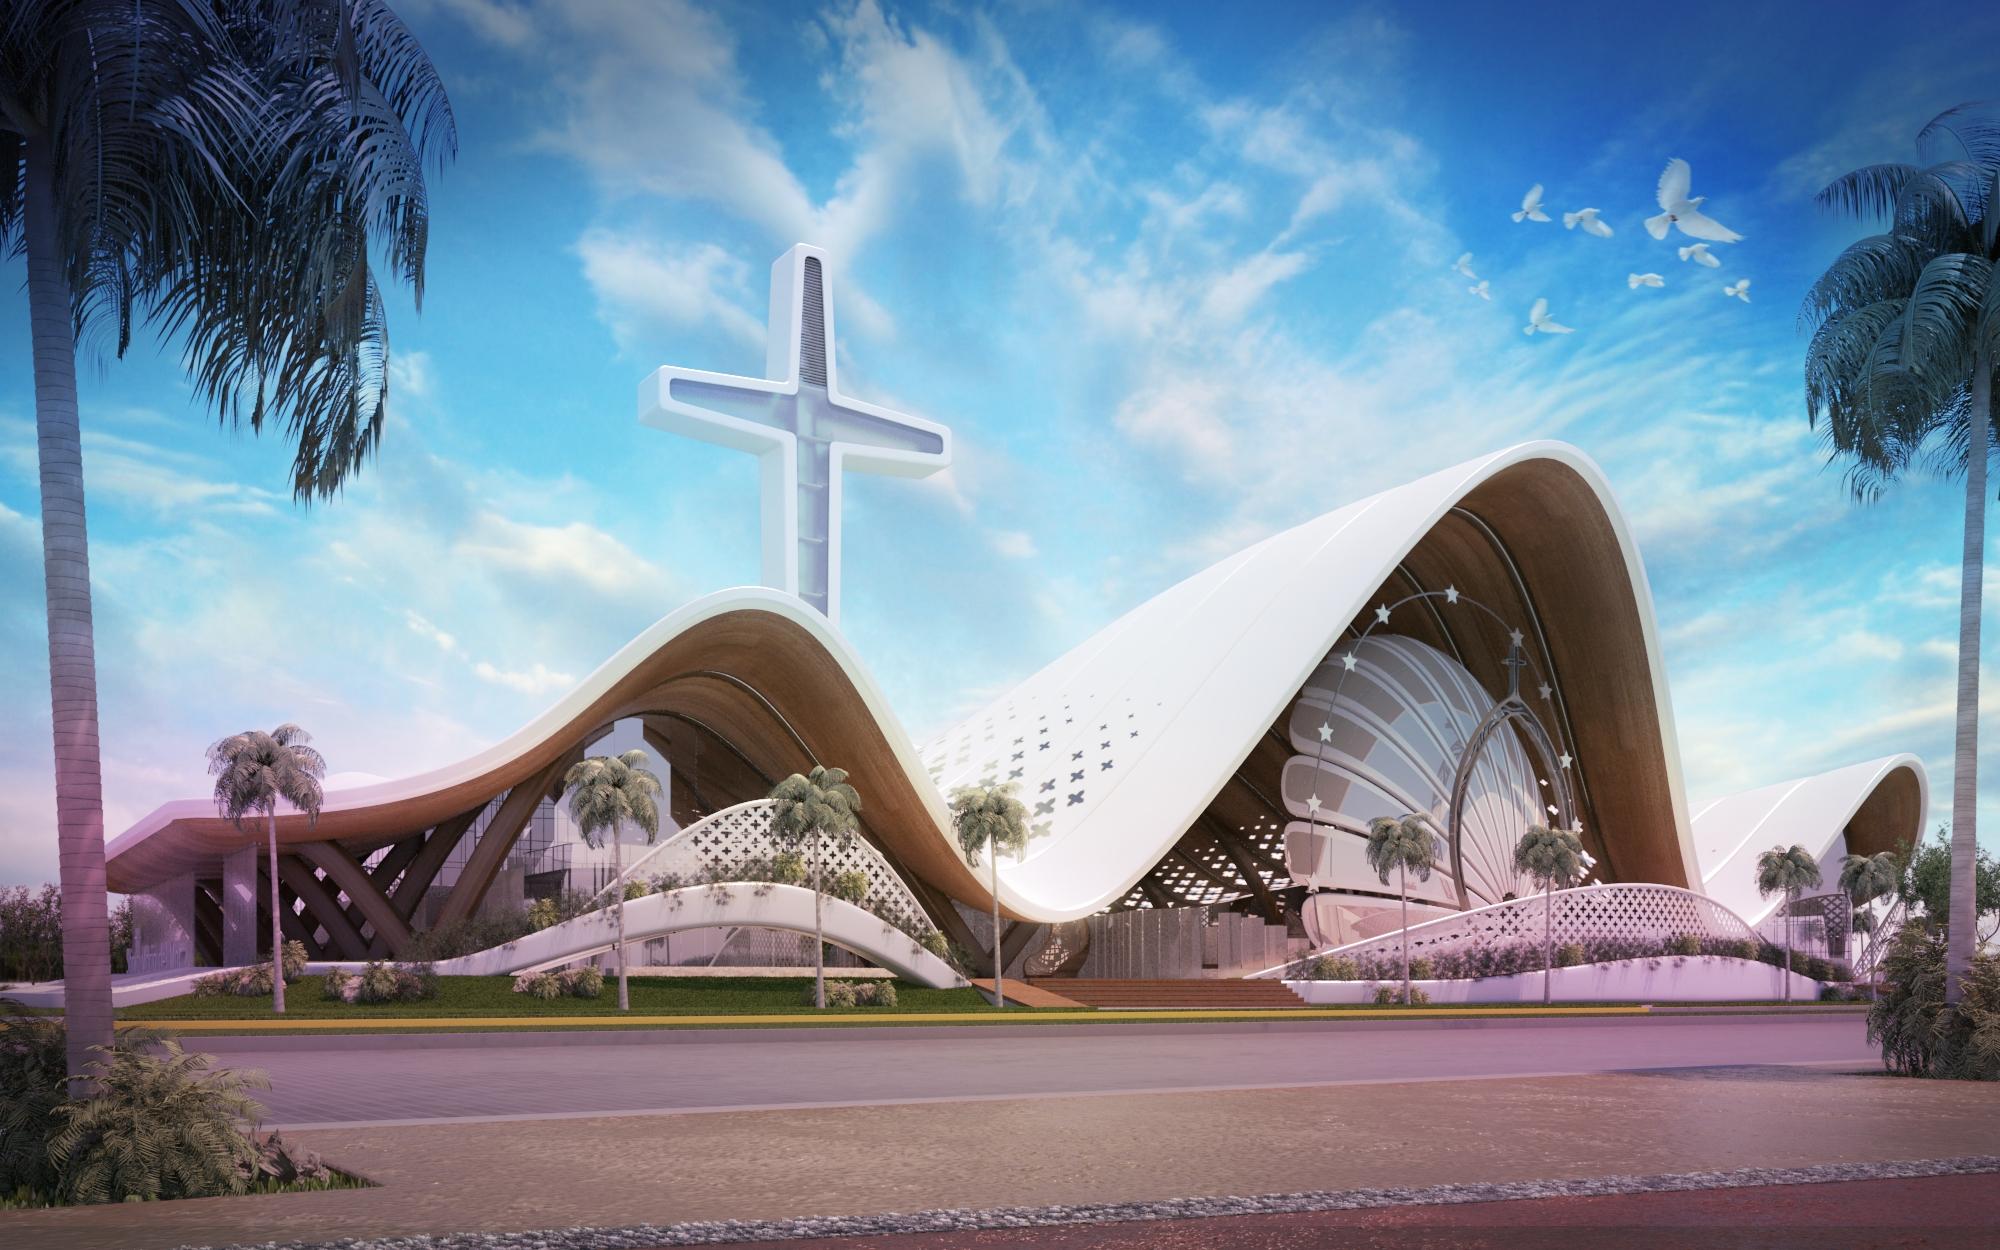 Santa maria del mar basilica sanzpont arquitectura for Imagenes de arquitectura